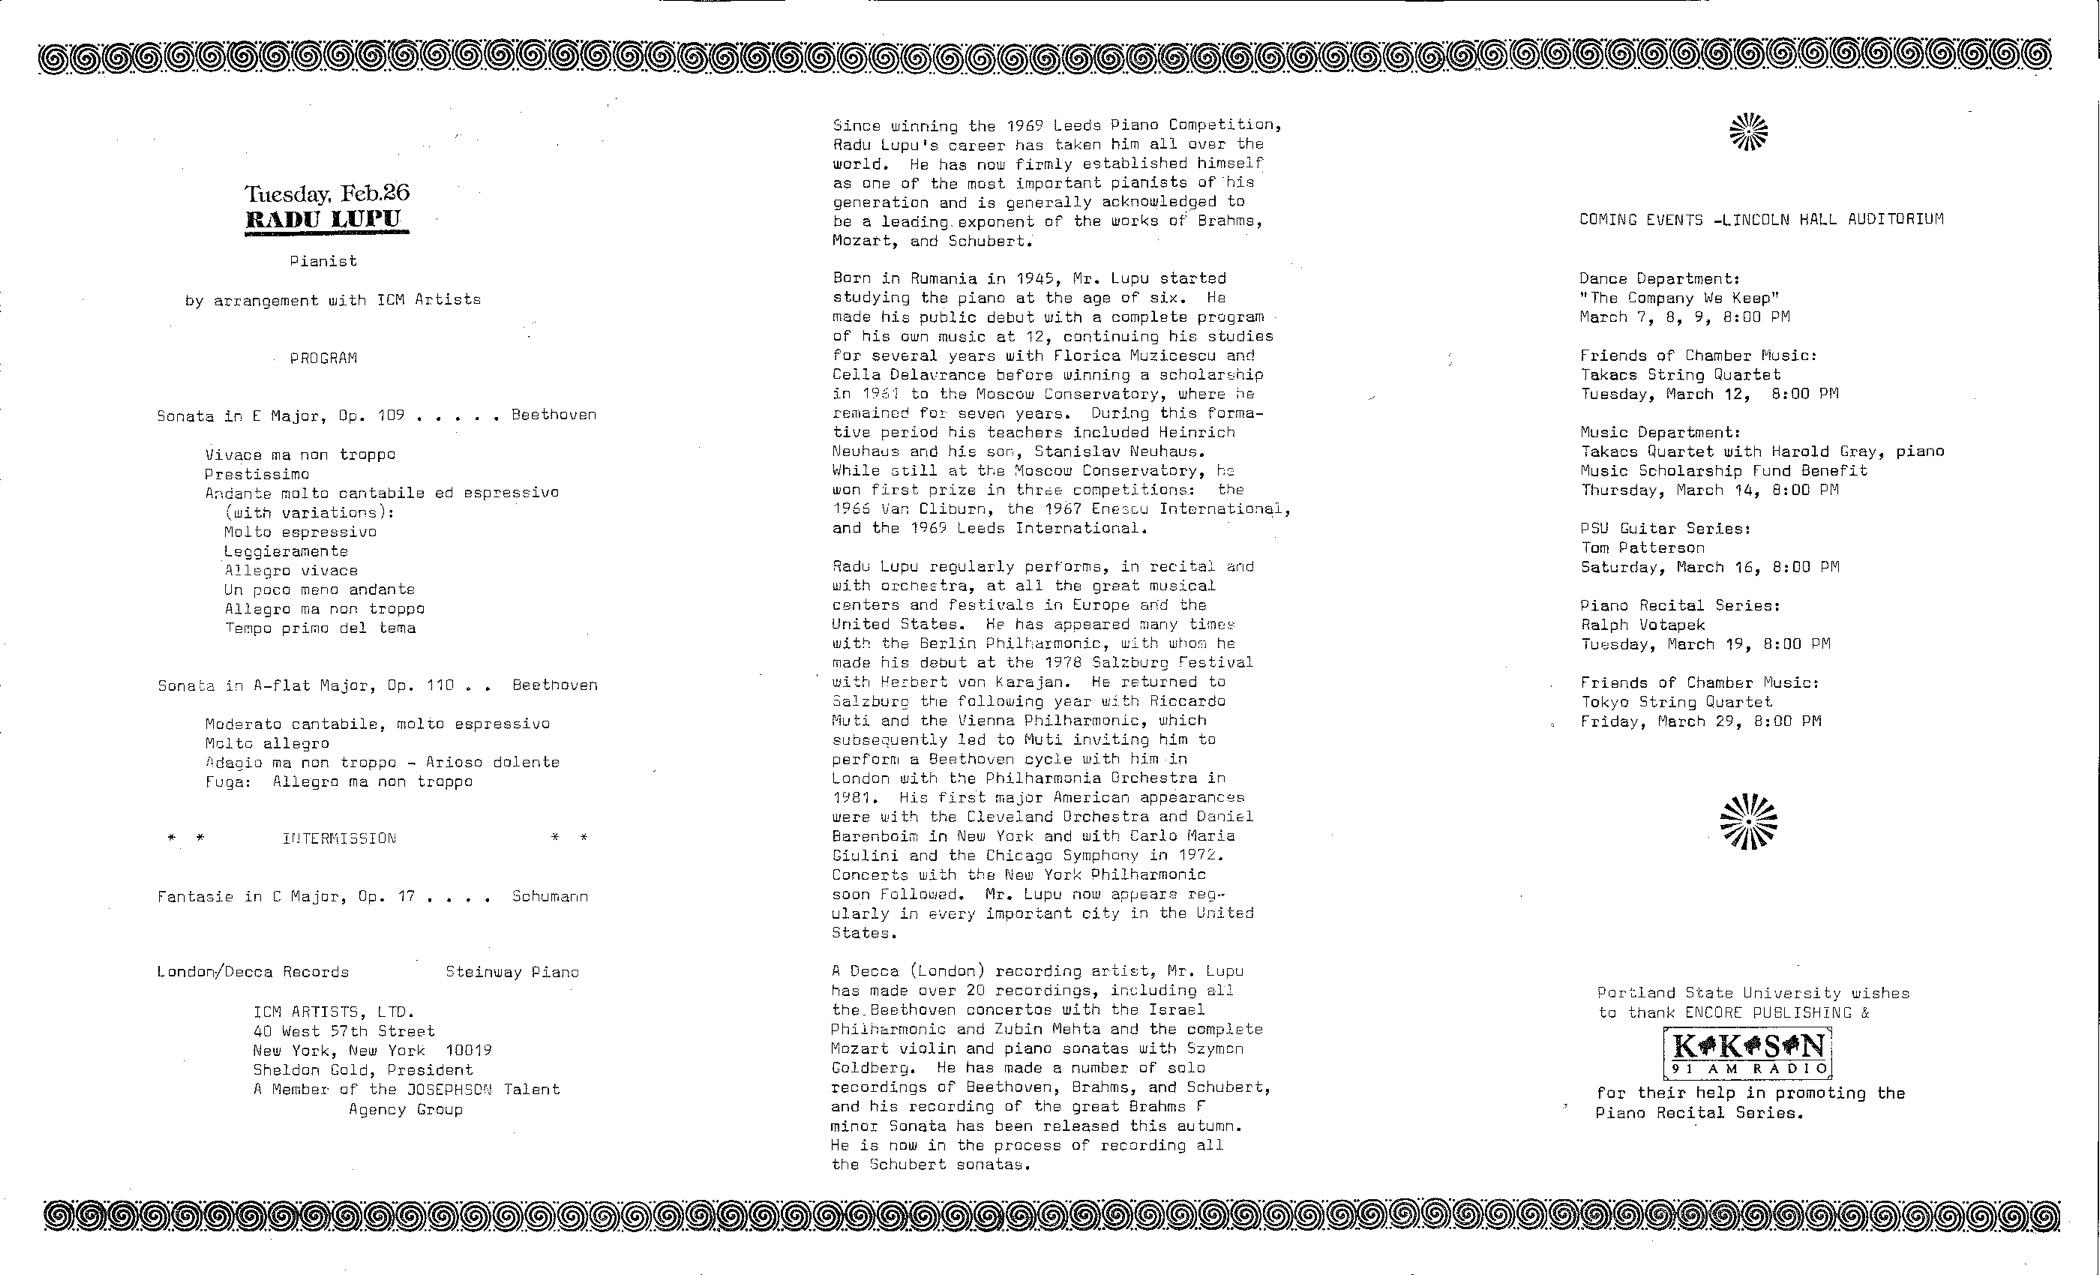 Lupu84-85_Program2.jpg